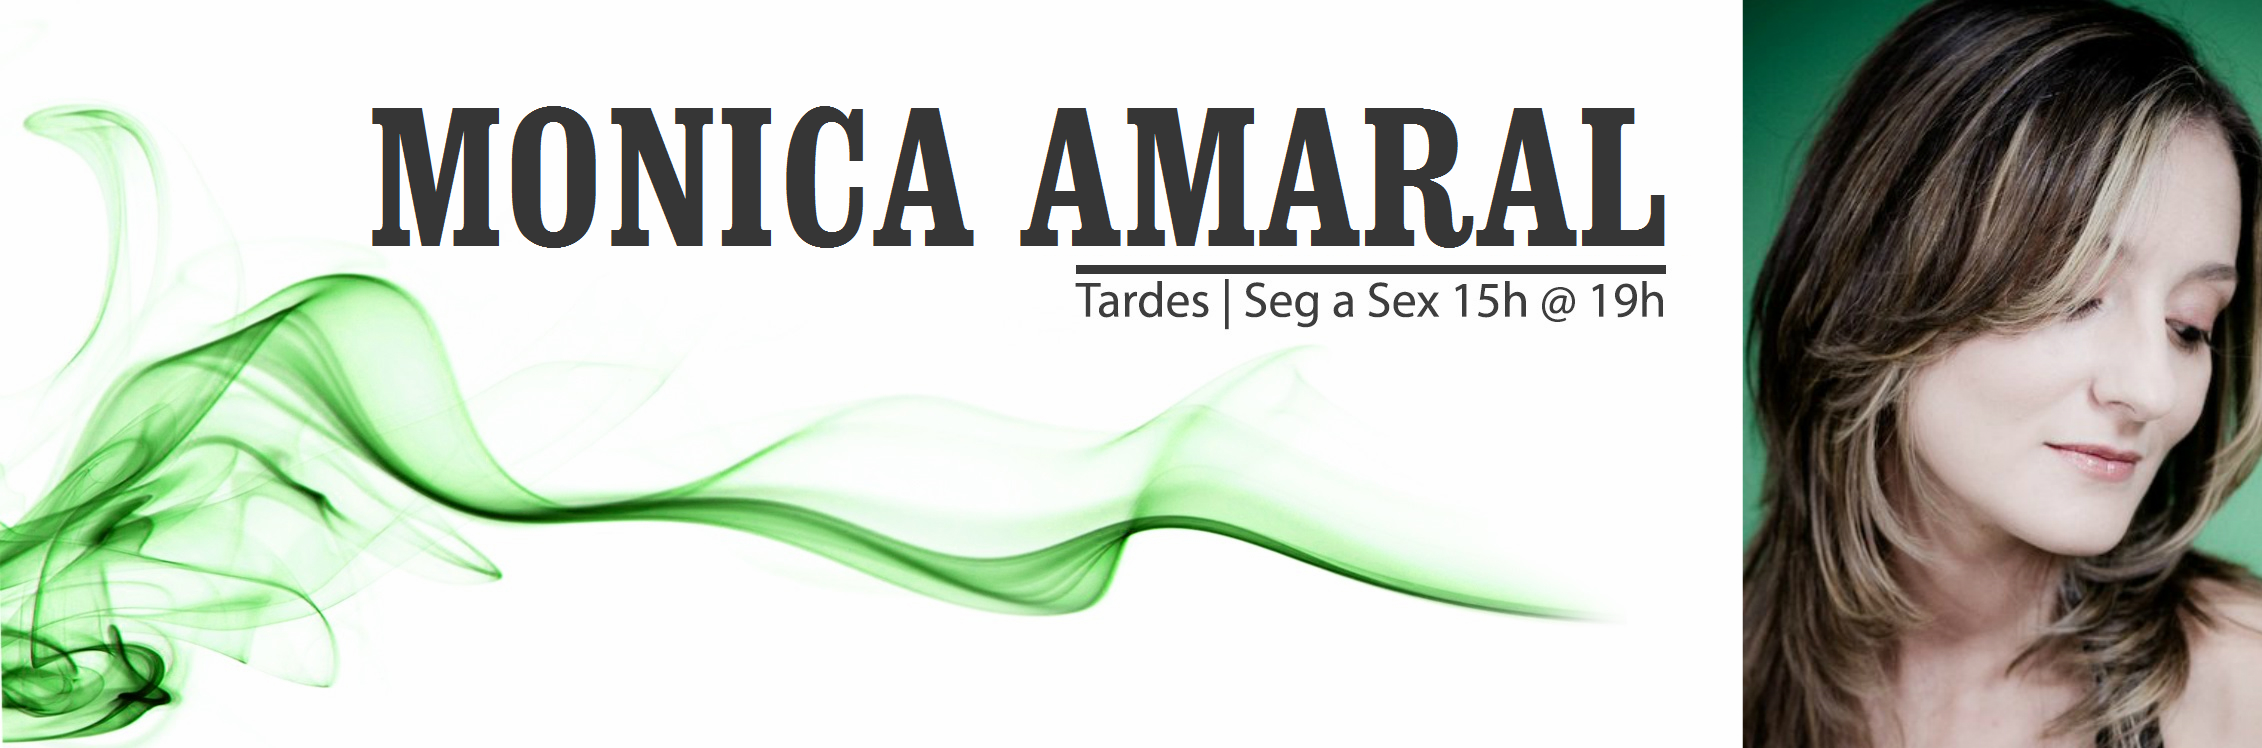 monica_amaral_2